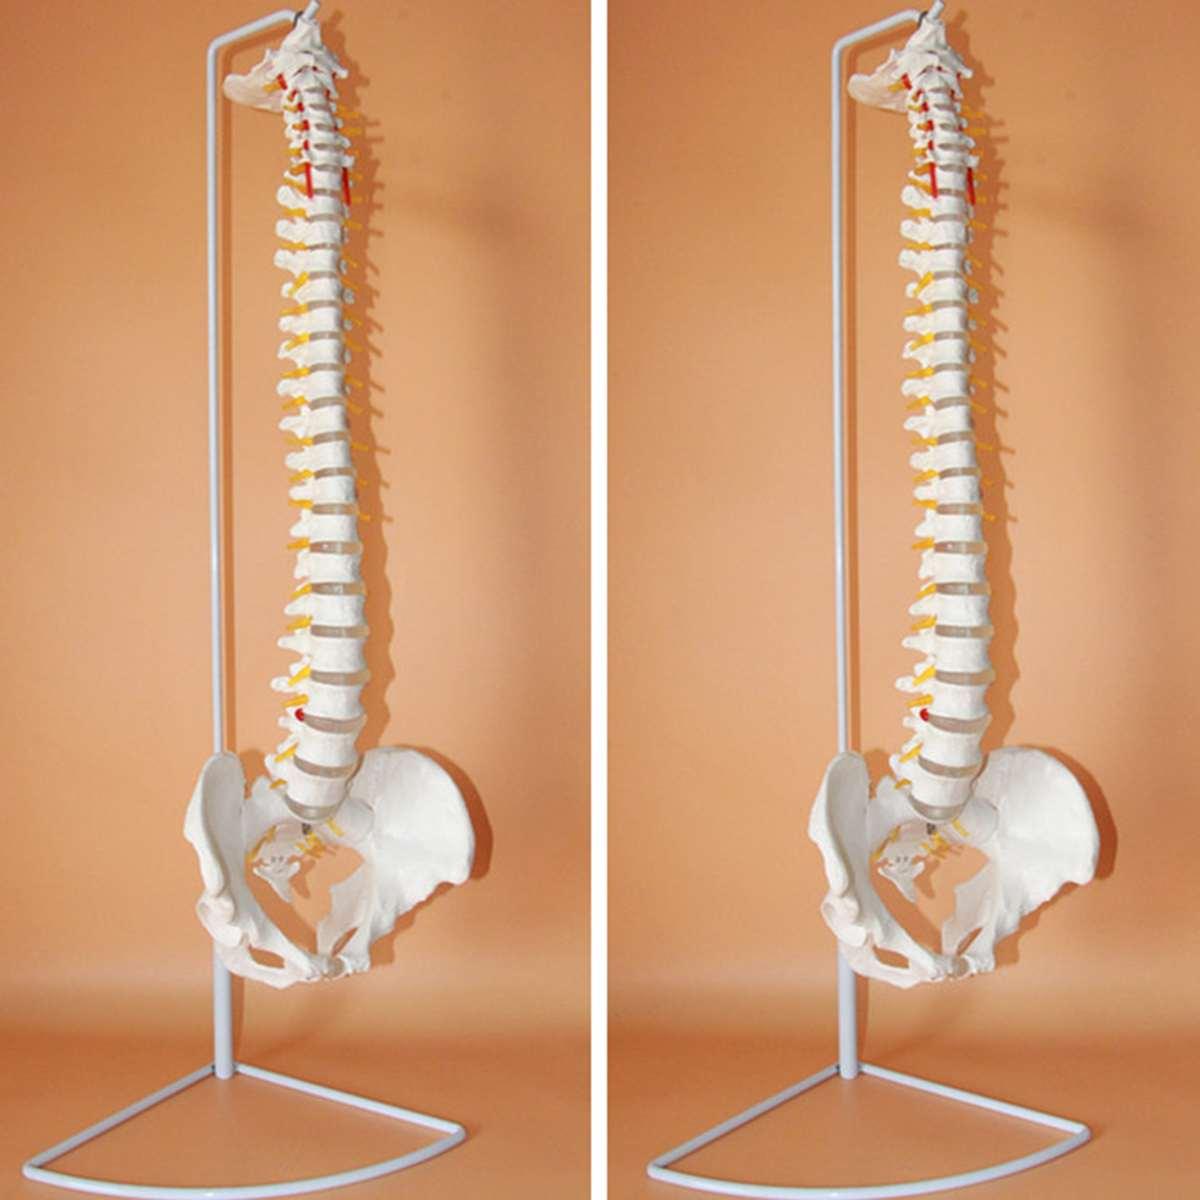 73cm Life Size Flexible Chiropractic Human Spine Anatomical Anatomy